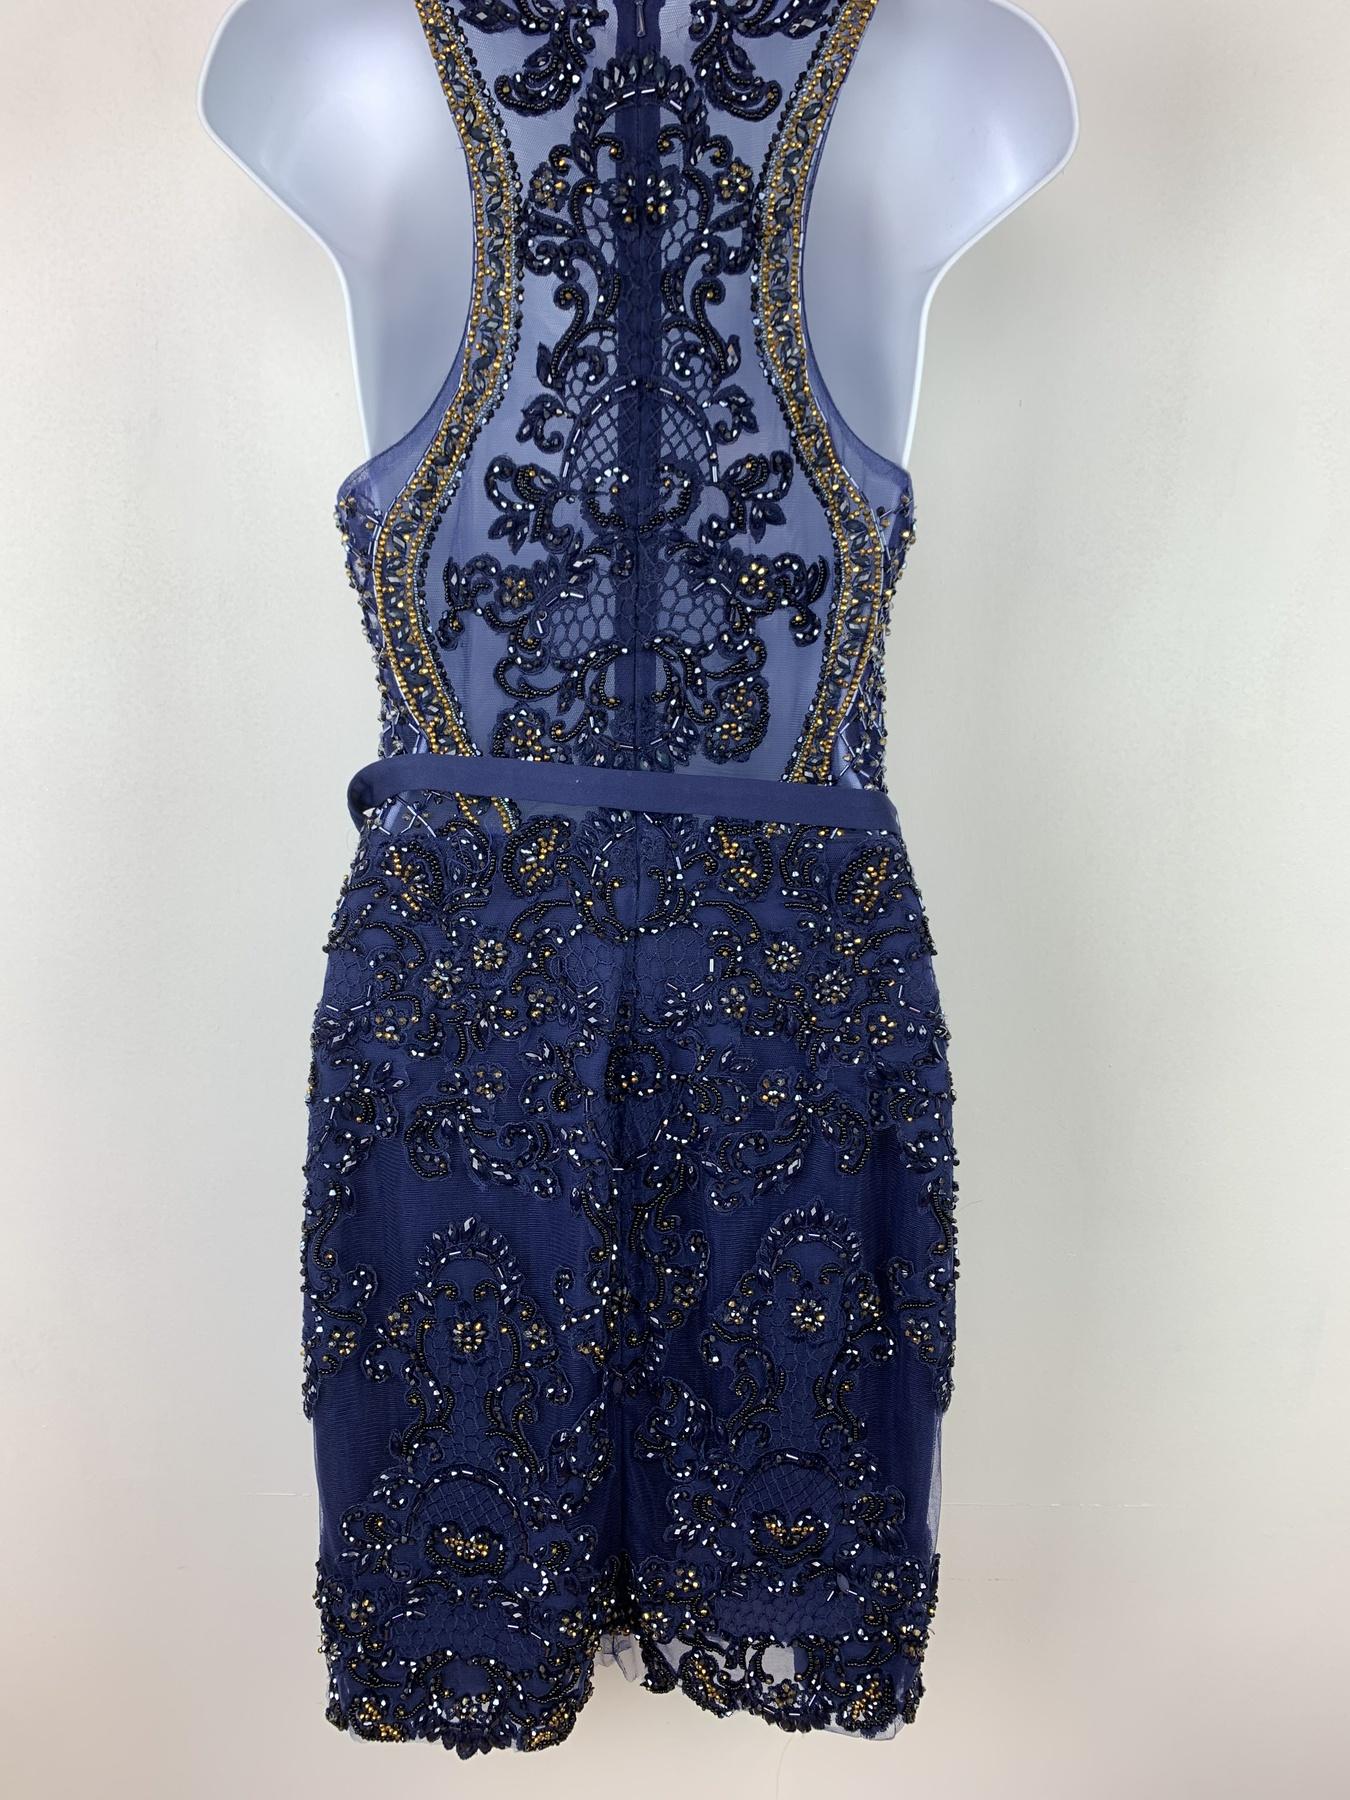 Vienna Blue Size 2 Halter Mini Cocktail Dress on Queenly